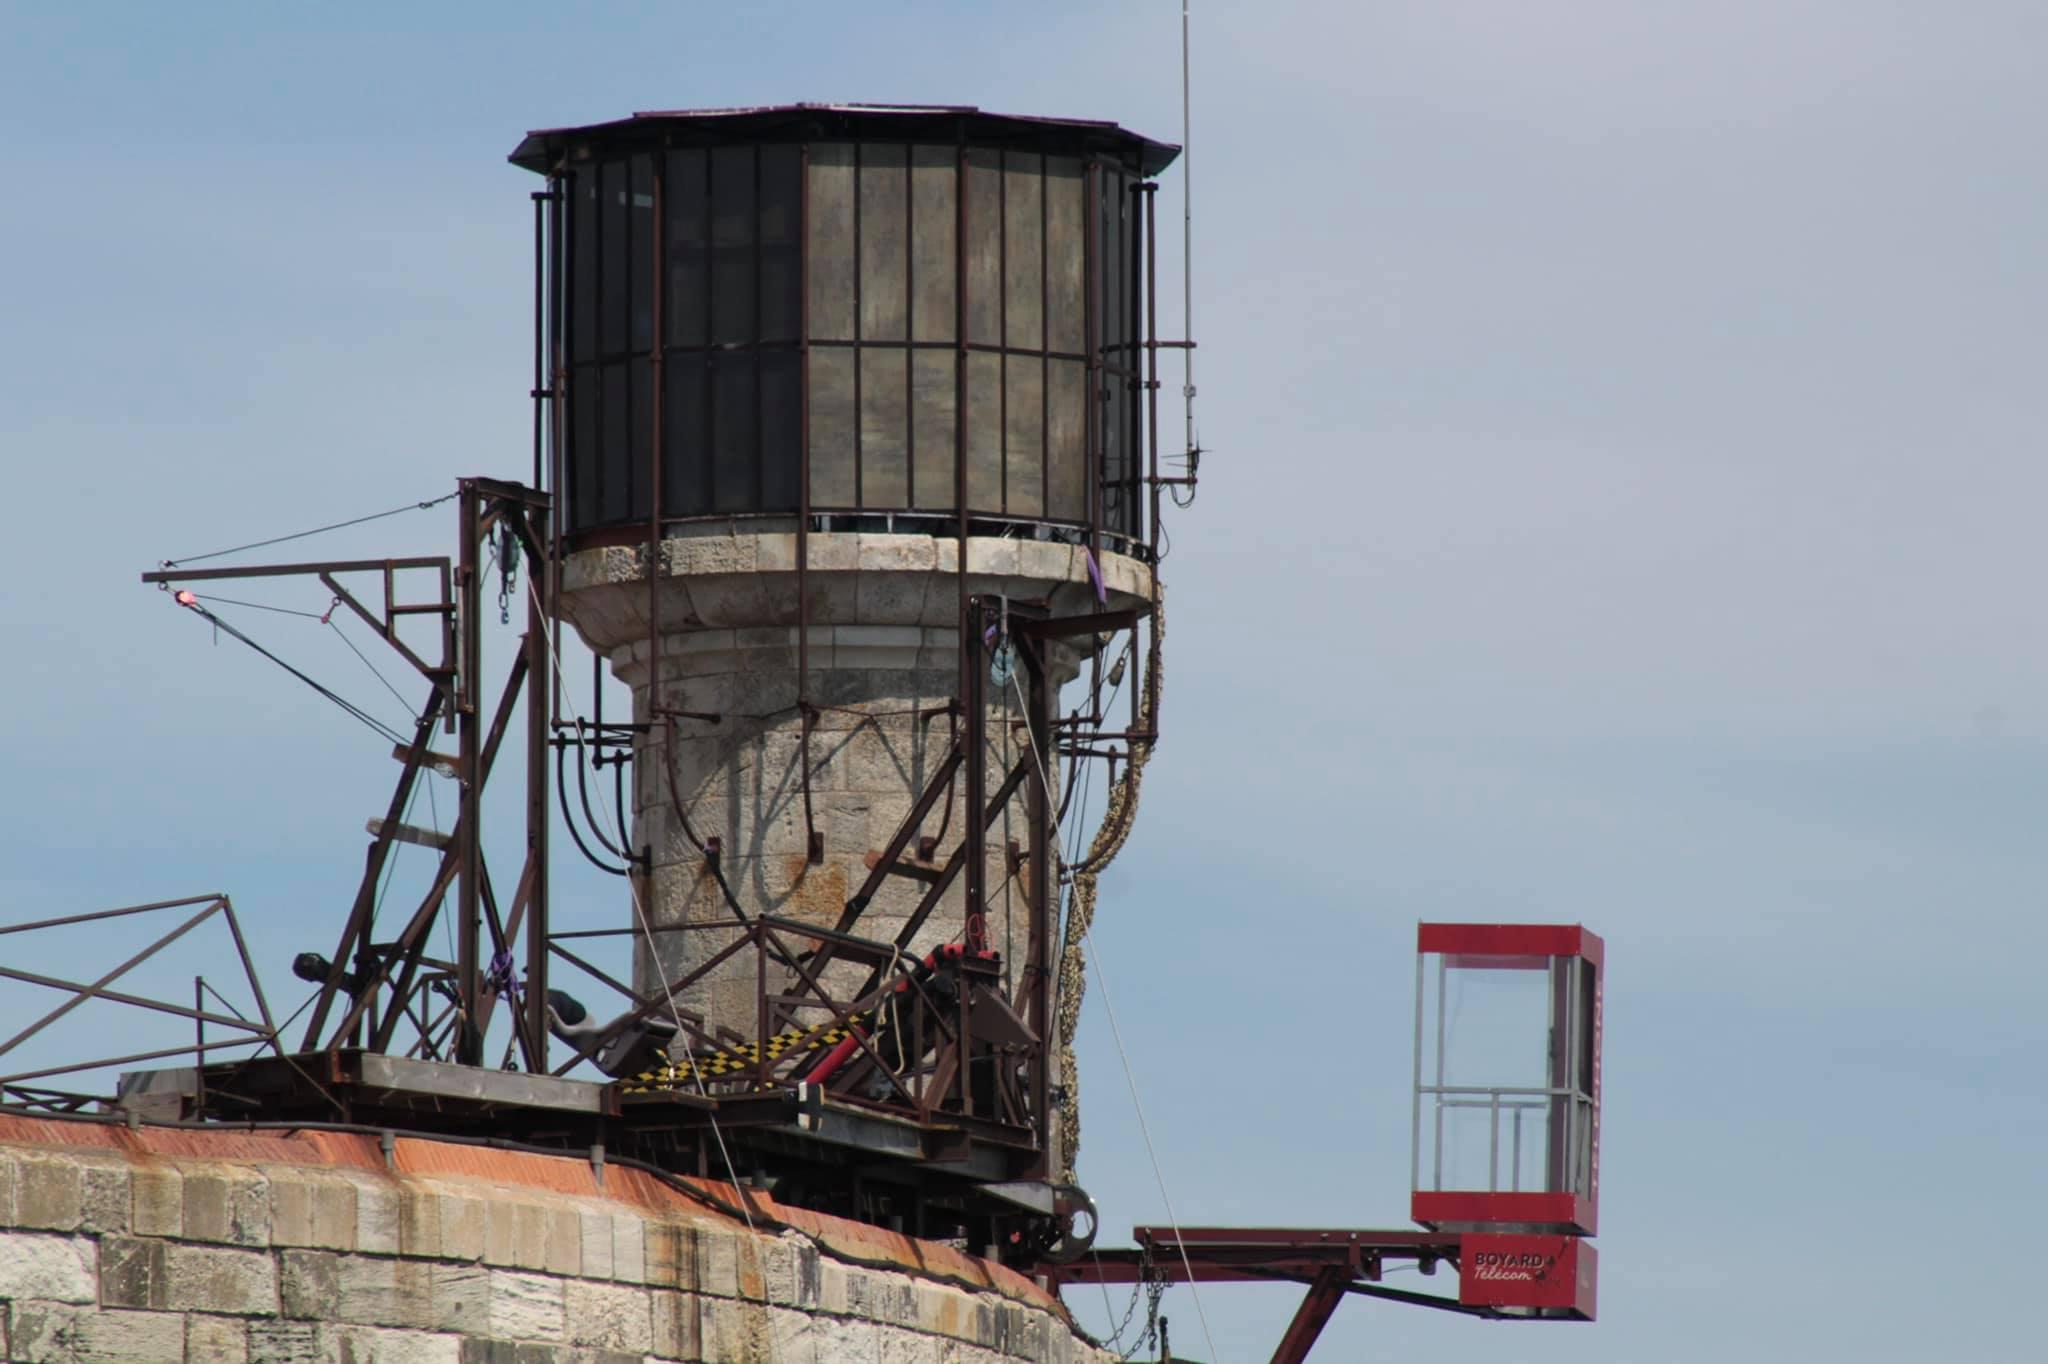 Photos des tournages Fort Boyard 2021 (production + candidats) - Page 6 18329210